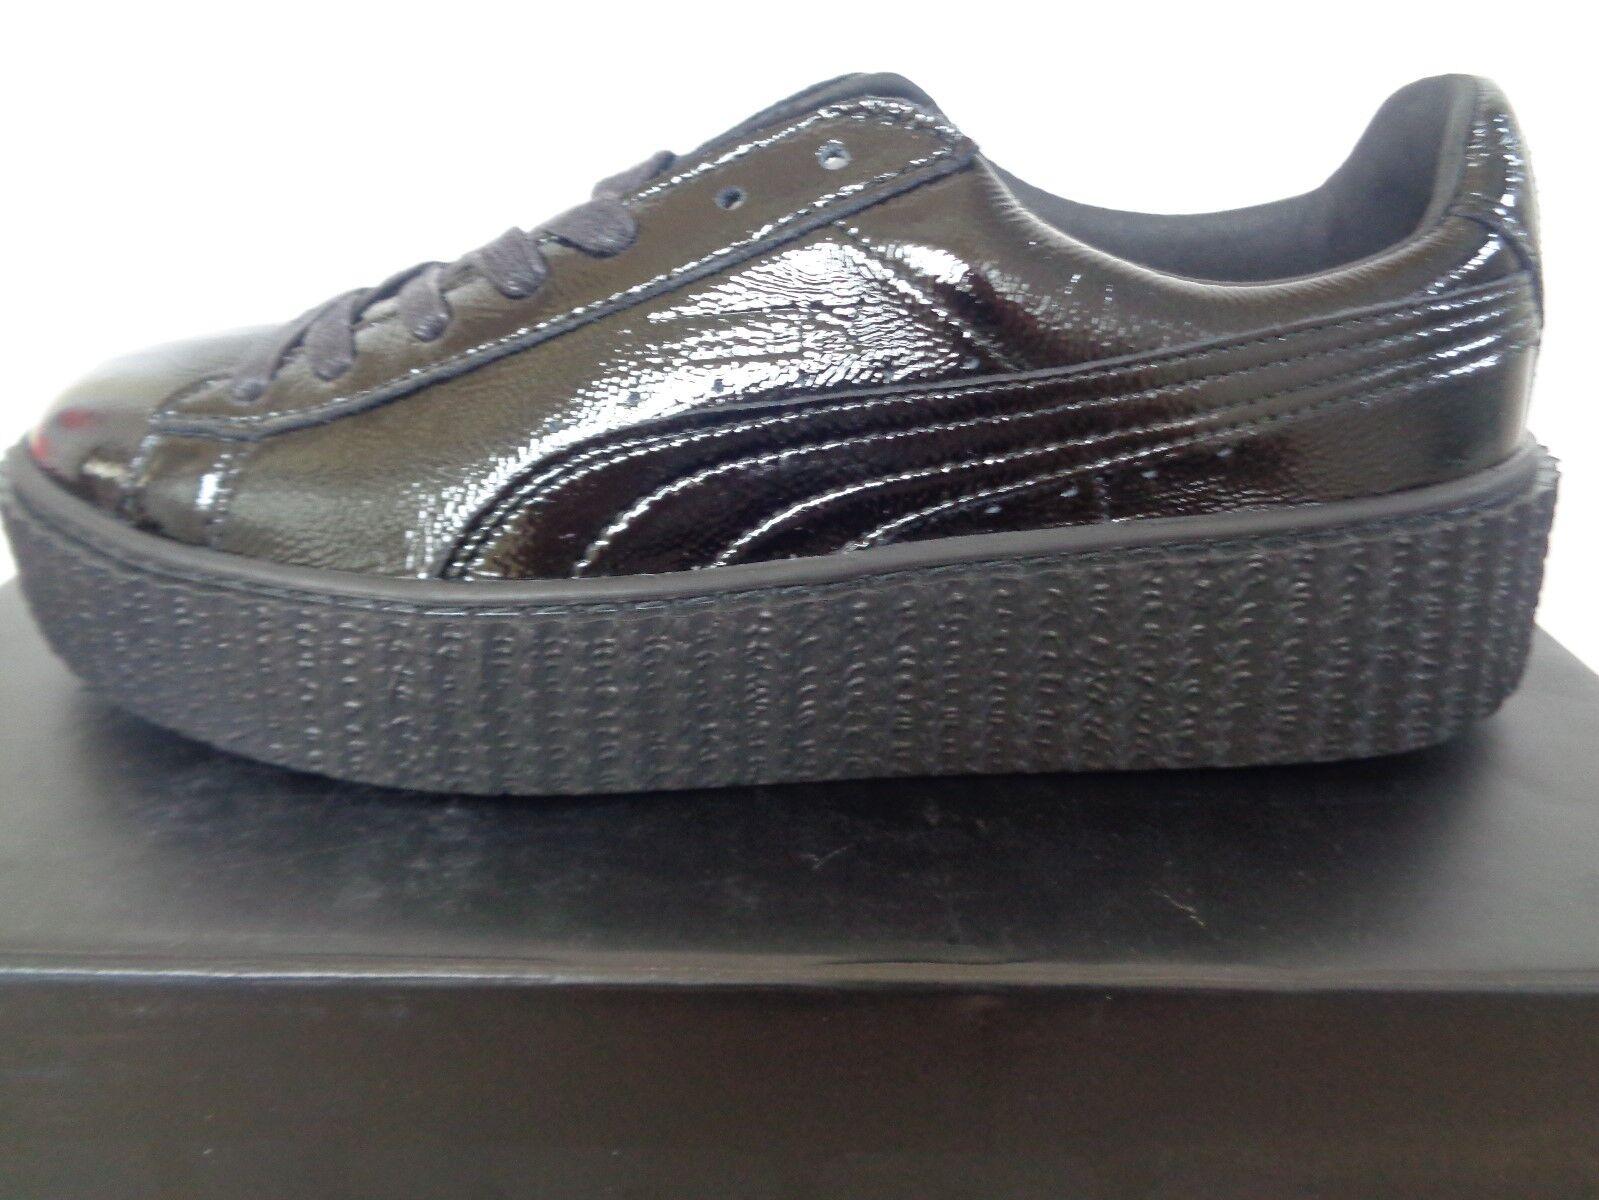 Puma Fenty Creeper Ridé brevet Rihanna Chaussures 364465 01 UK 5 EU 38 US 7.5 NEW